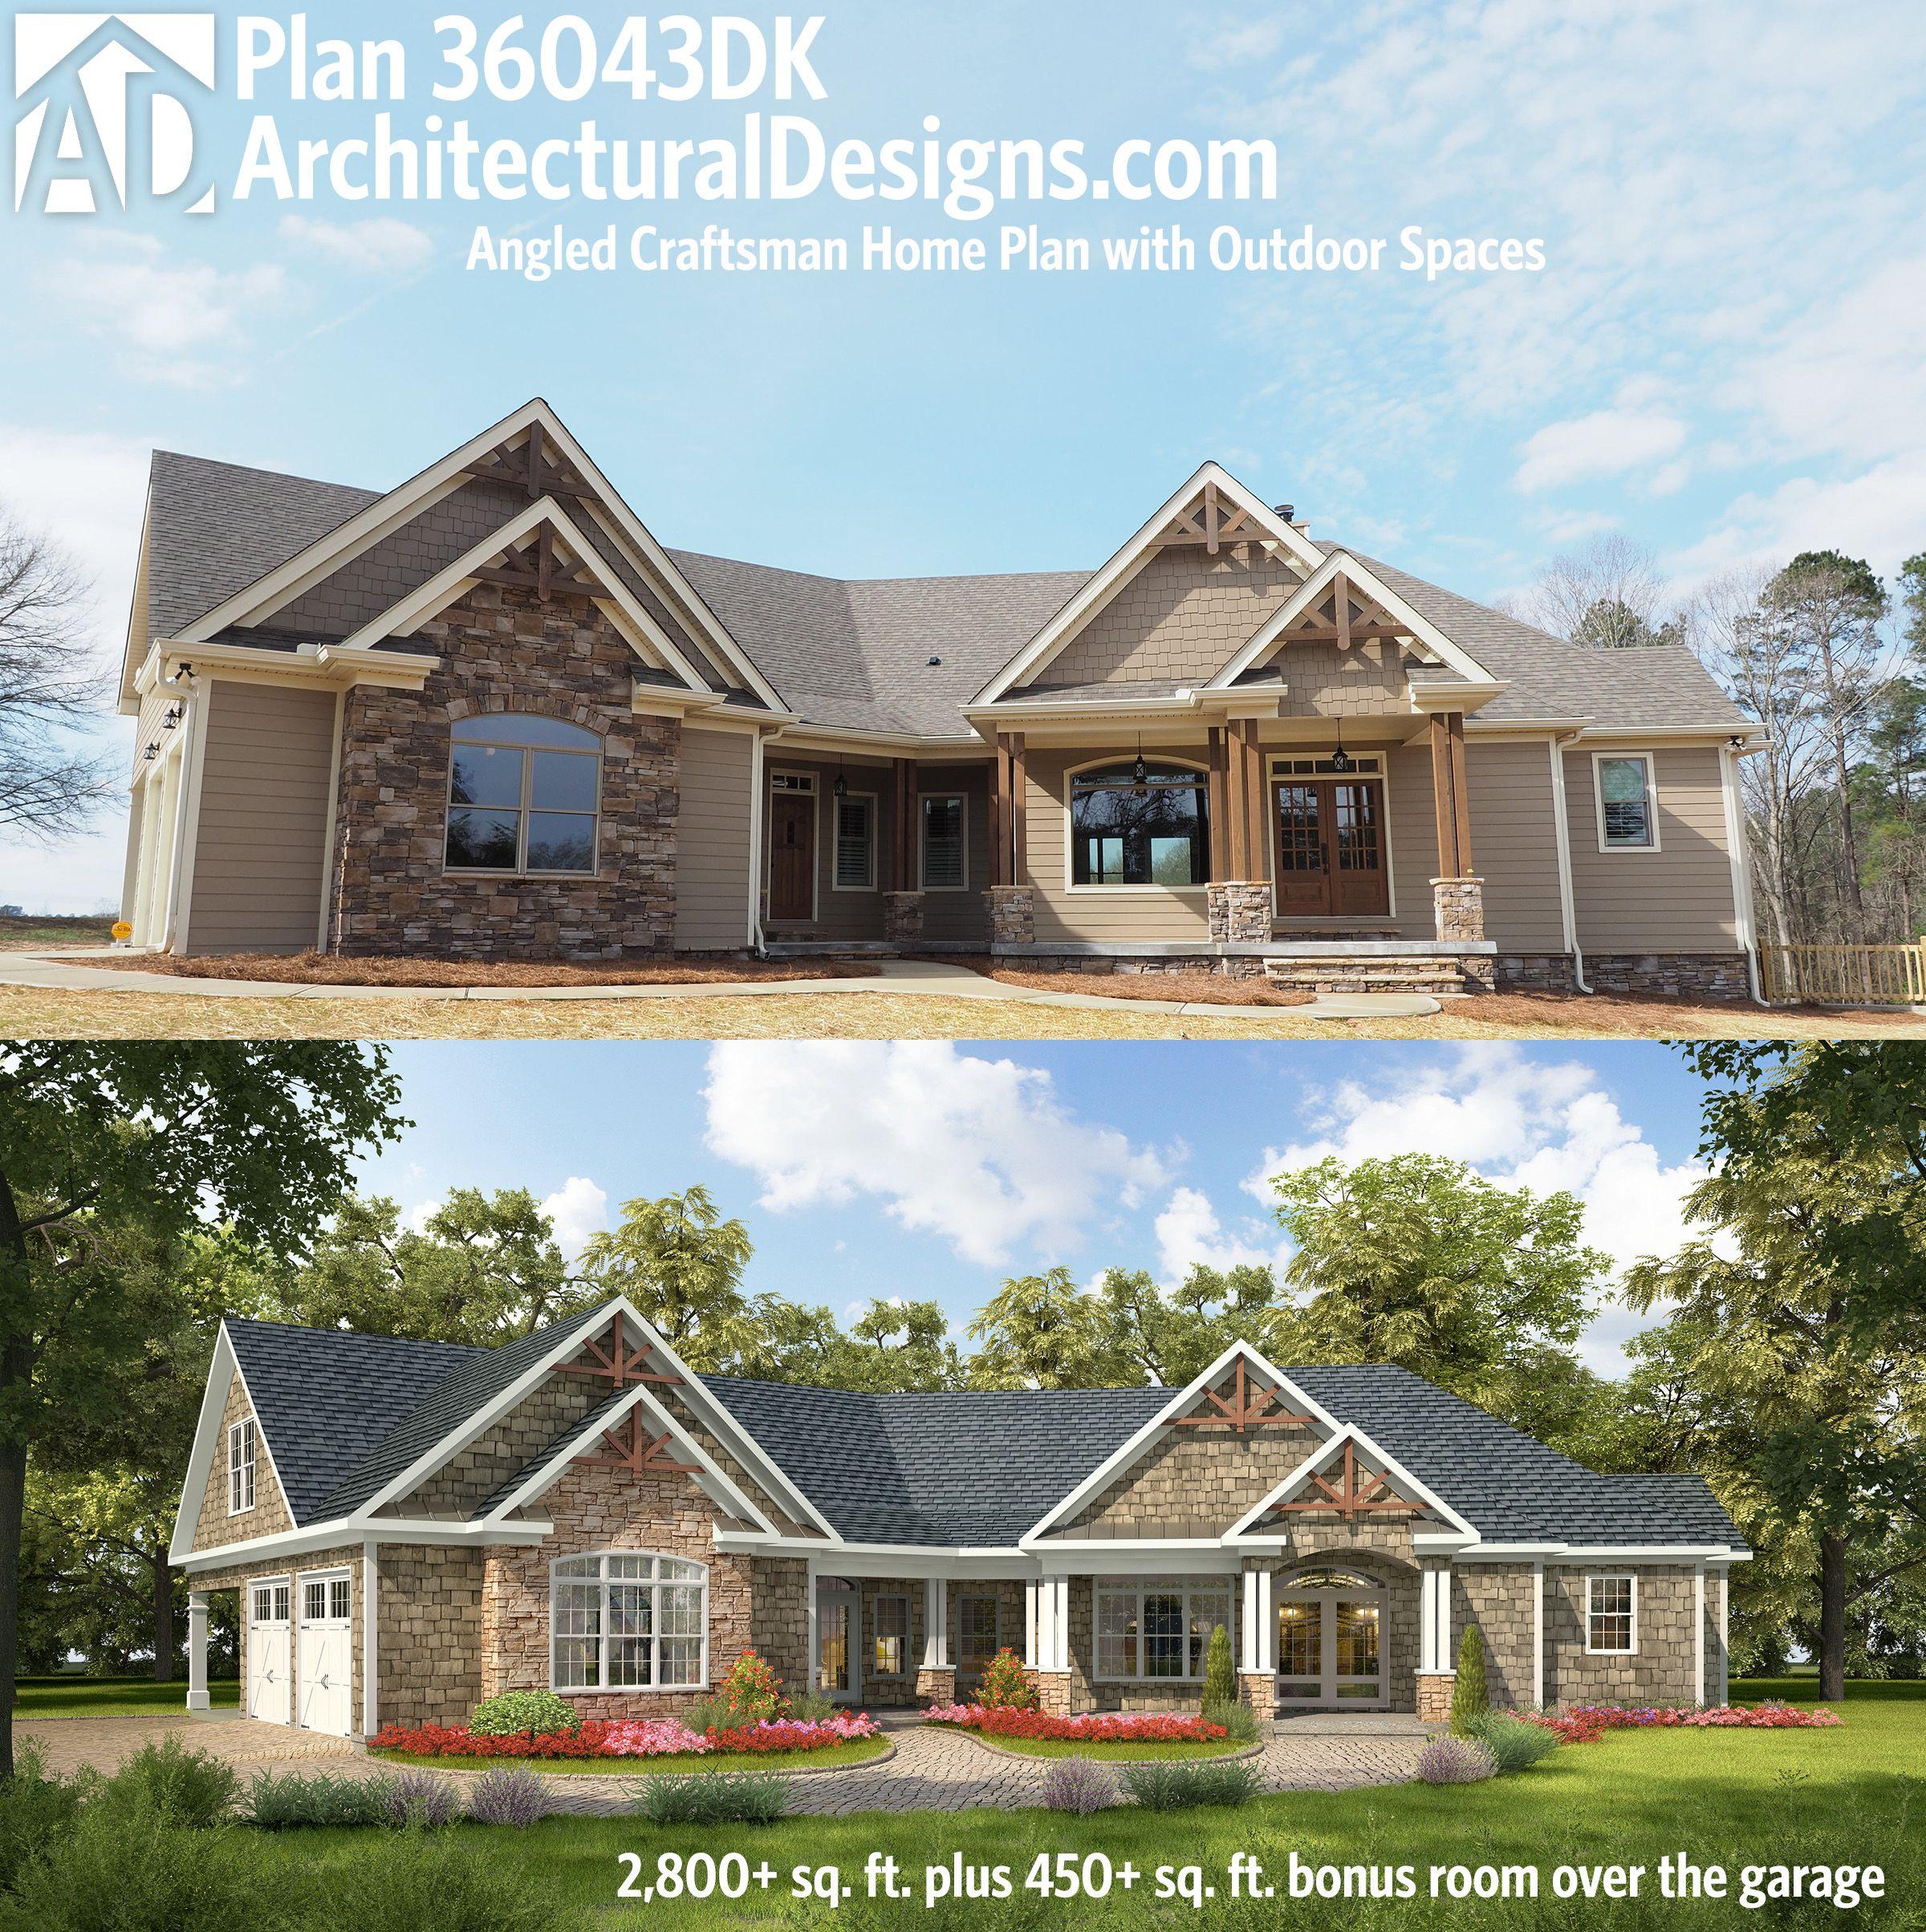 Craftsman Style Det Garage Garage Plans: Plan 36043DK: Angled Craftsman Home Plan With Outdoor